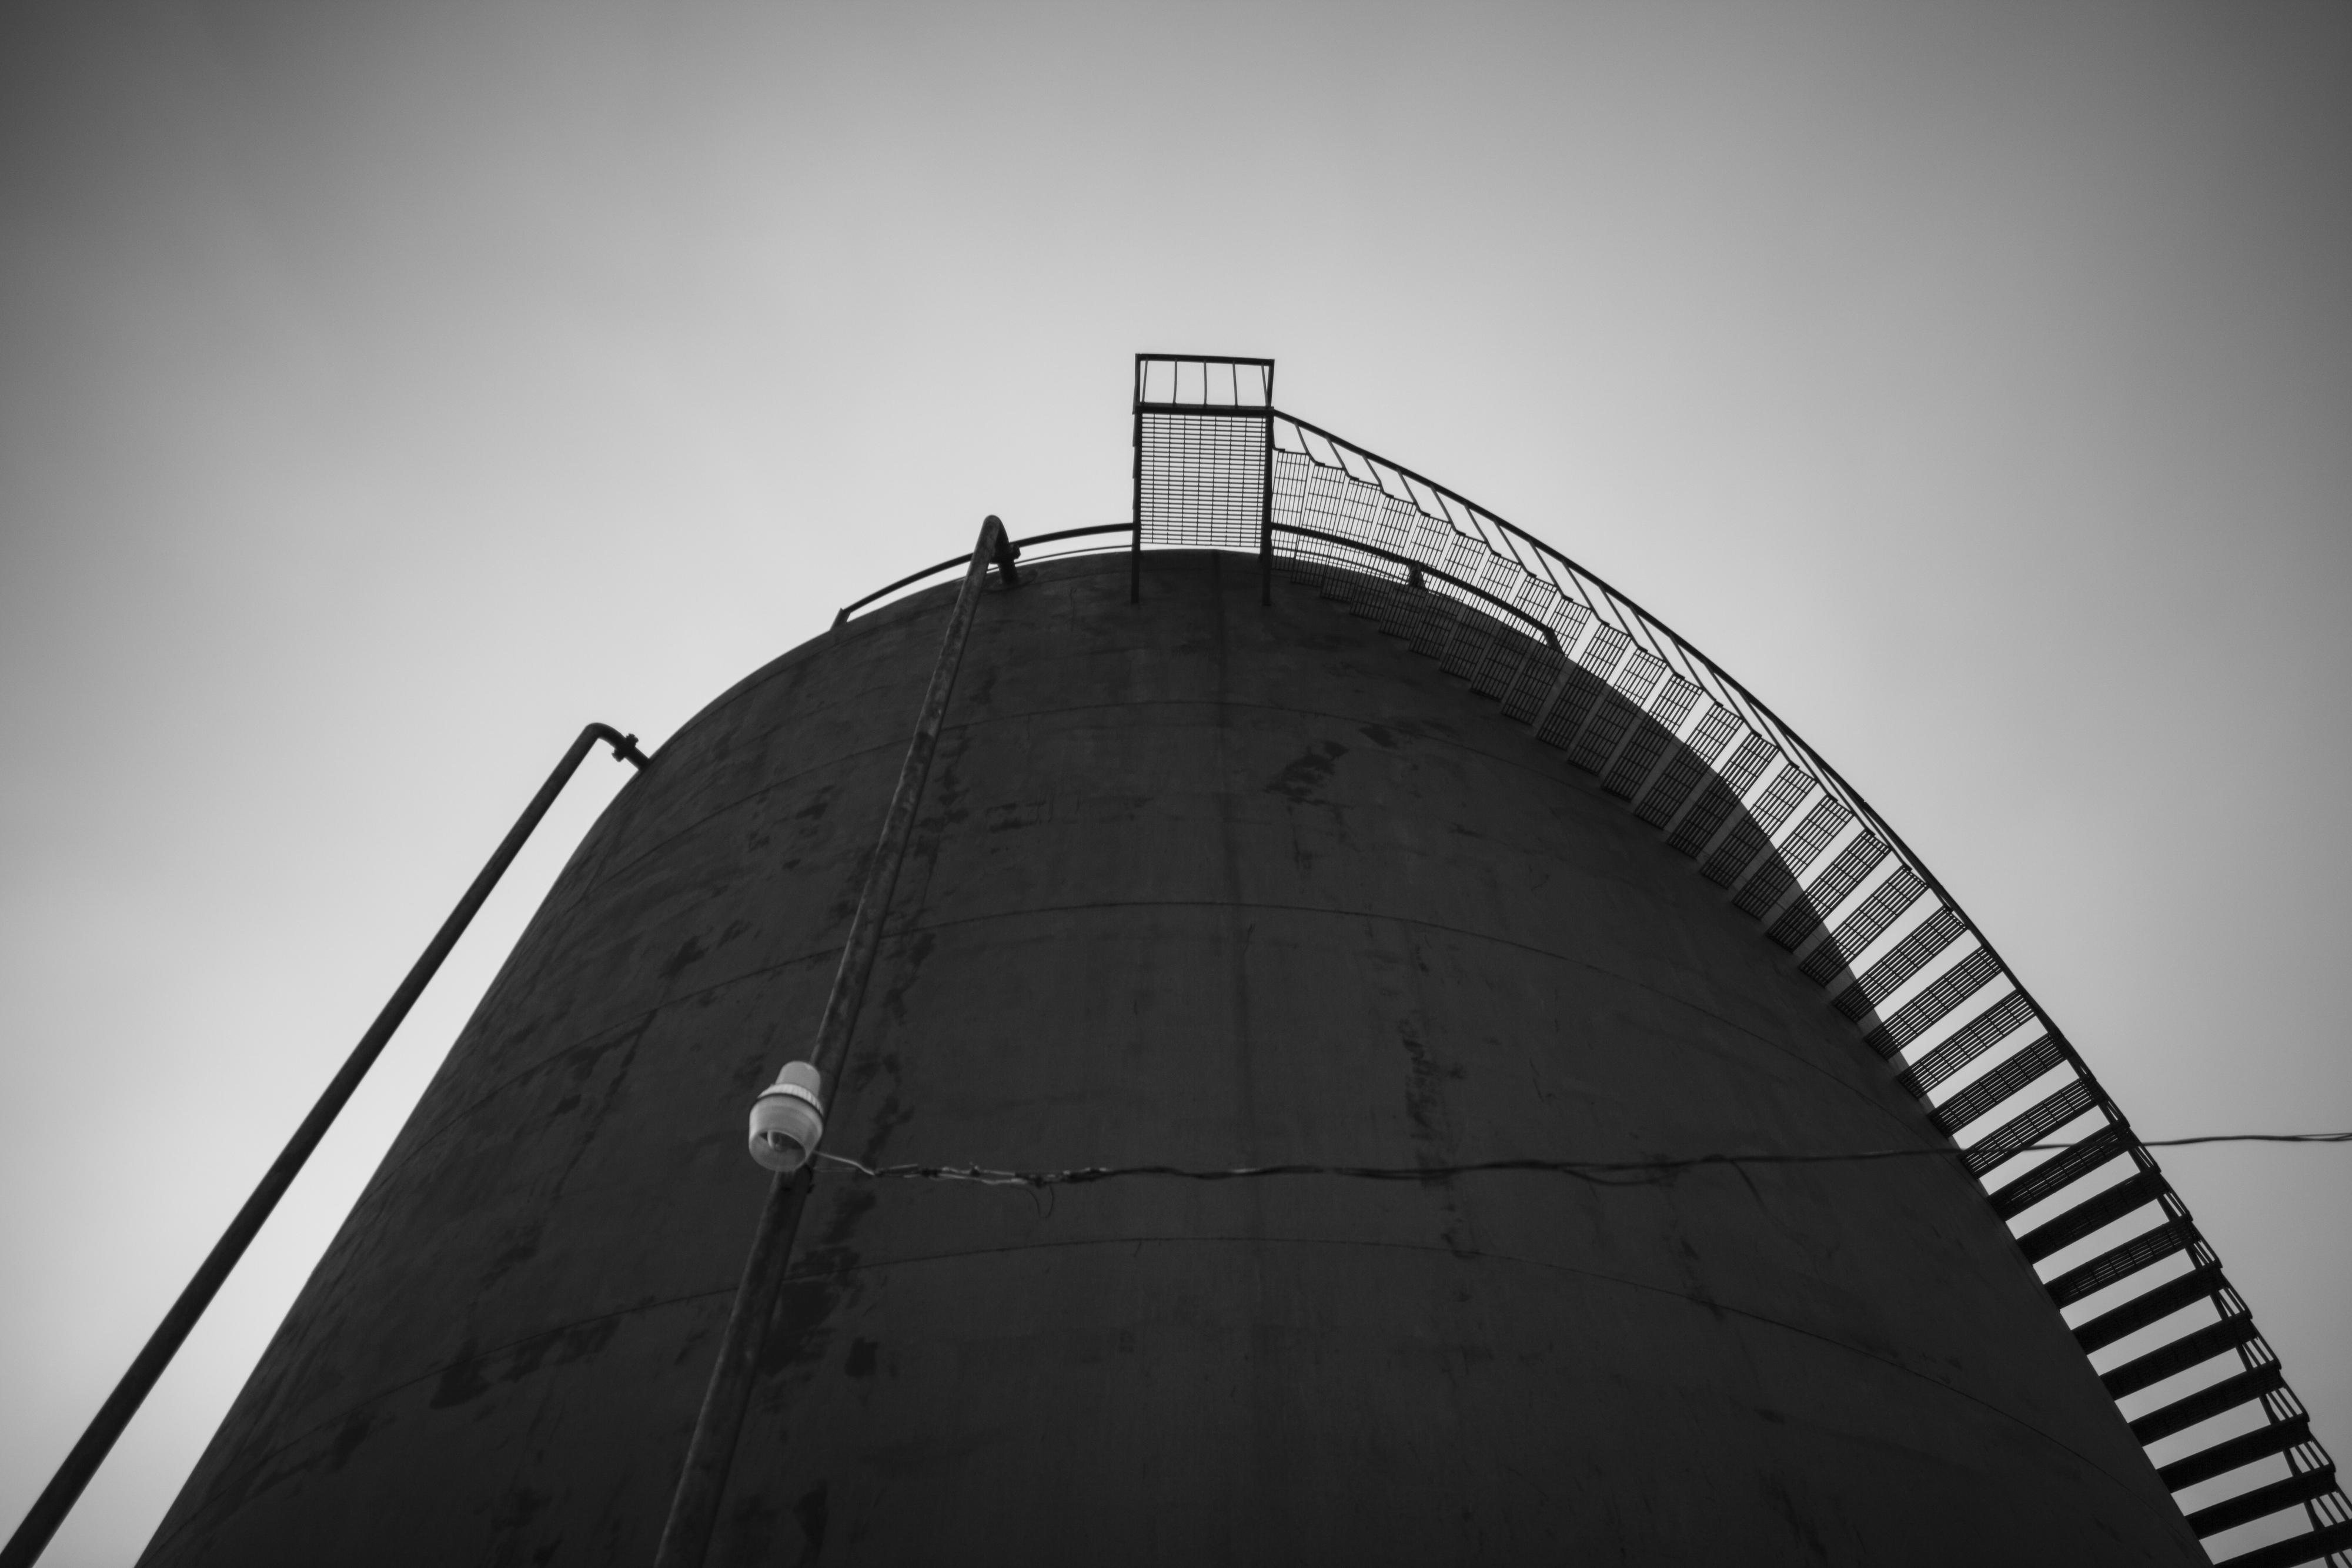 Escaliers 02